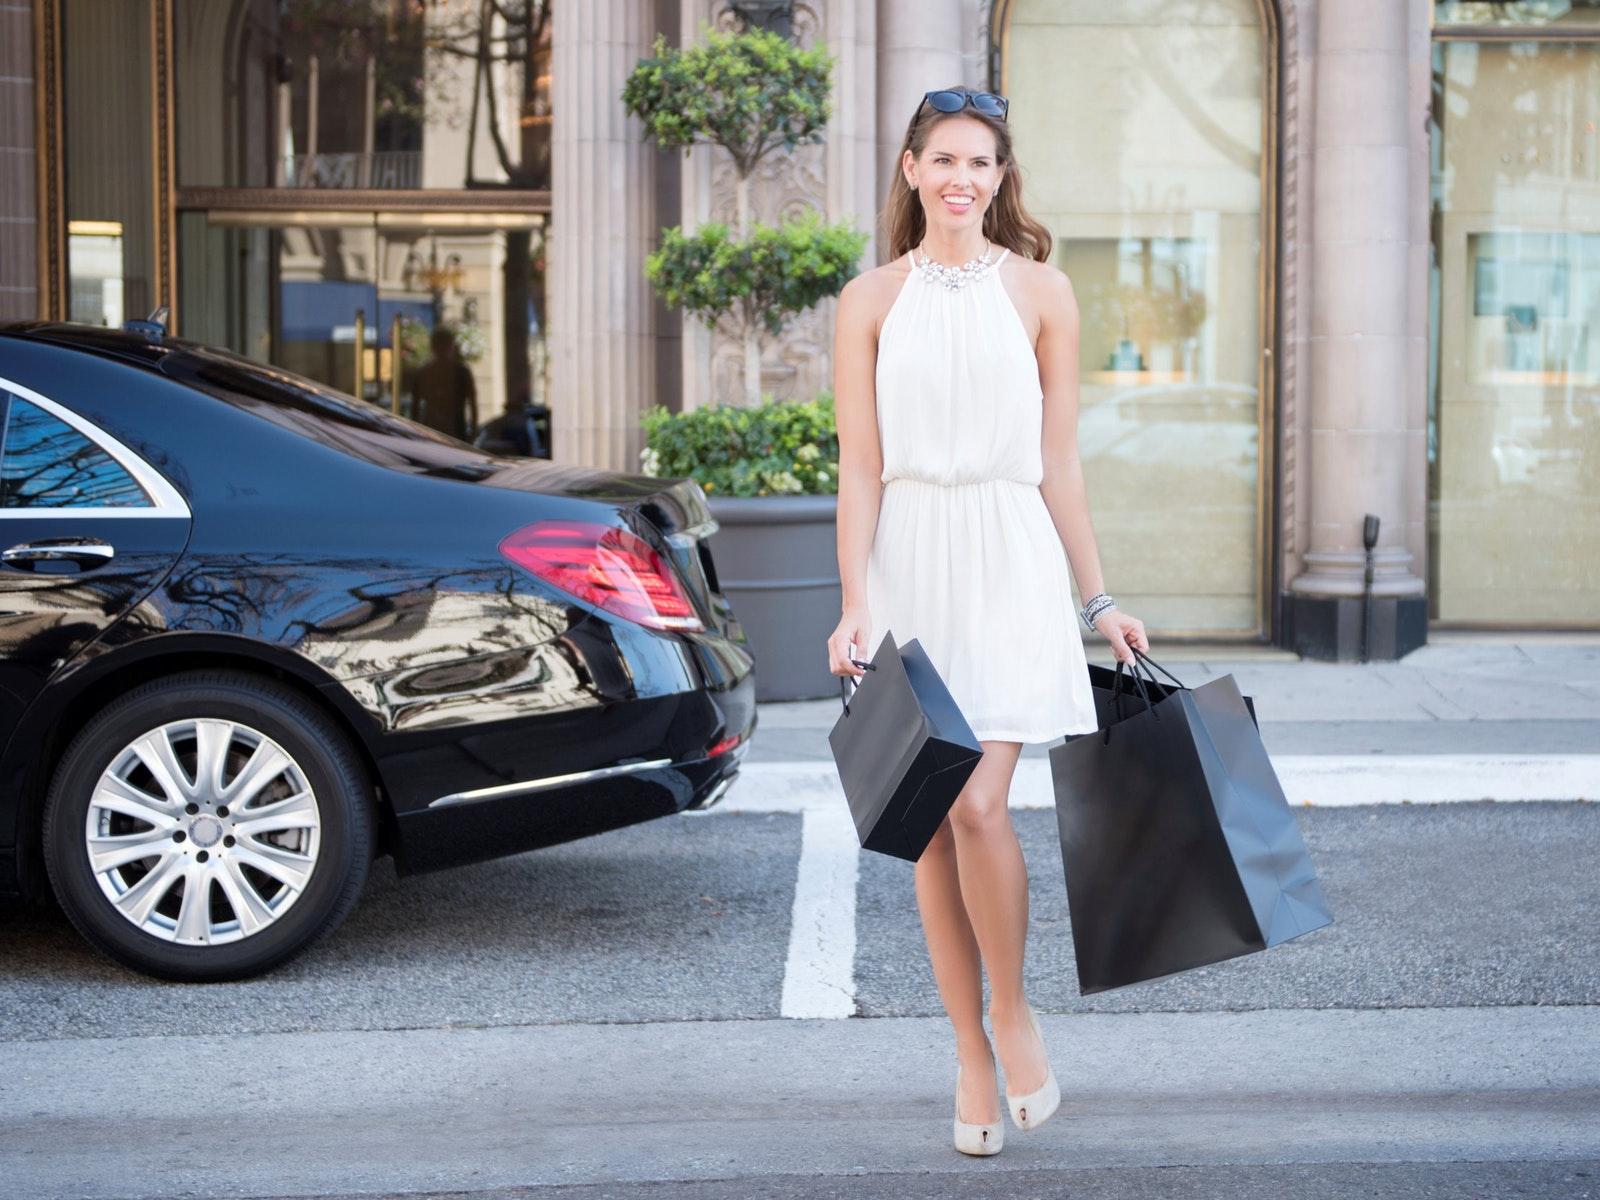 Australian Designer Experience Shopping Tour